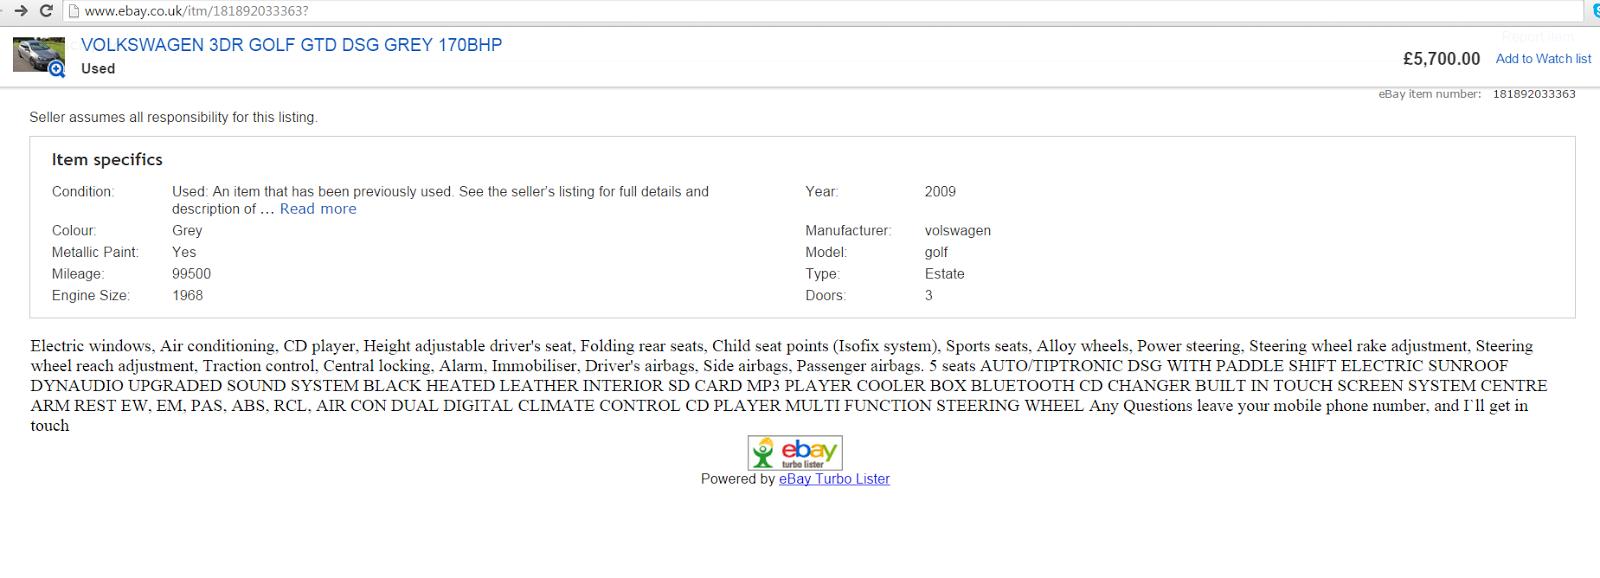 Ebay scam volkswagen 3dr golf gtd dsg grey 170bhp sl59pnn fraud sl59 pnn 05 oct 15